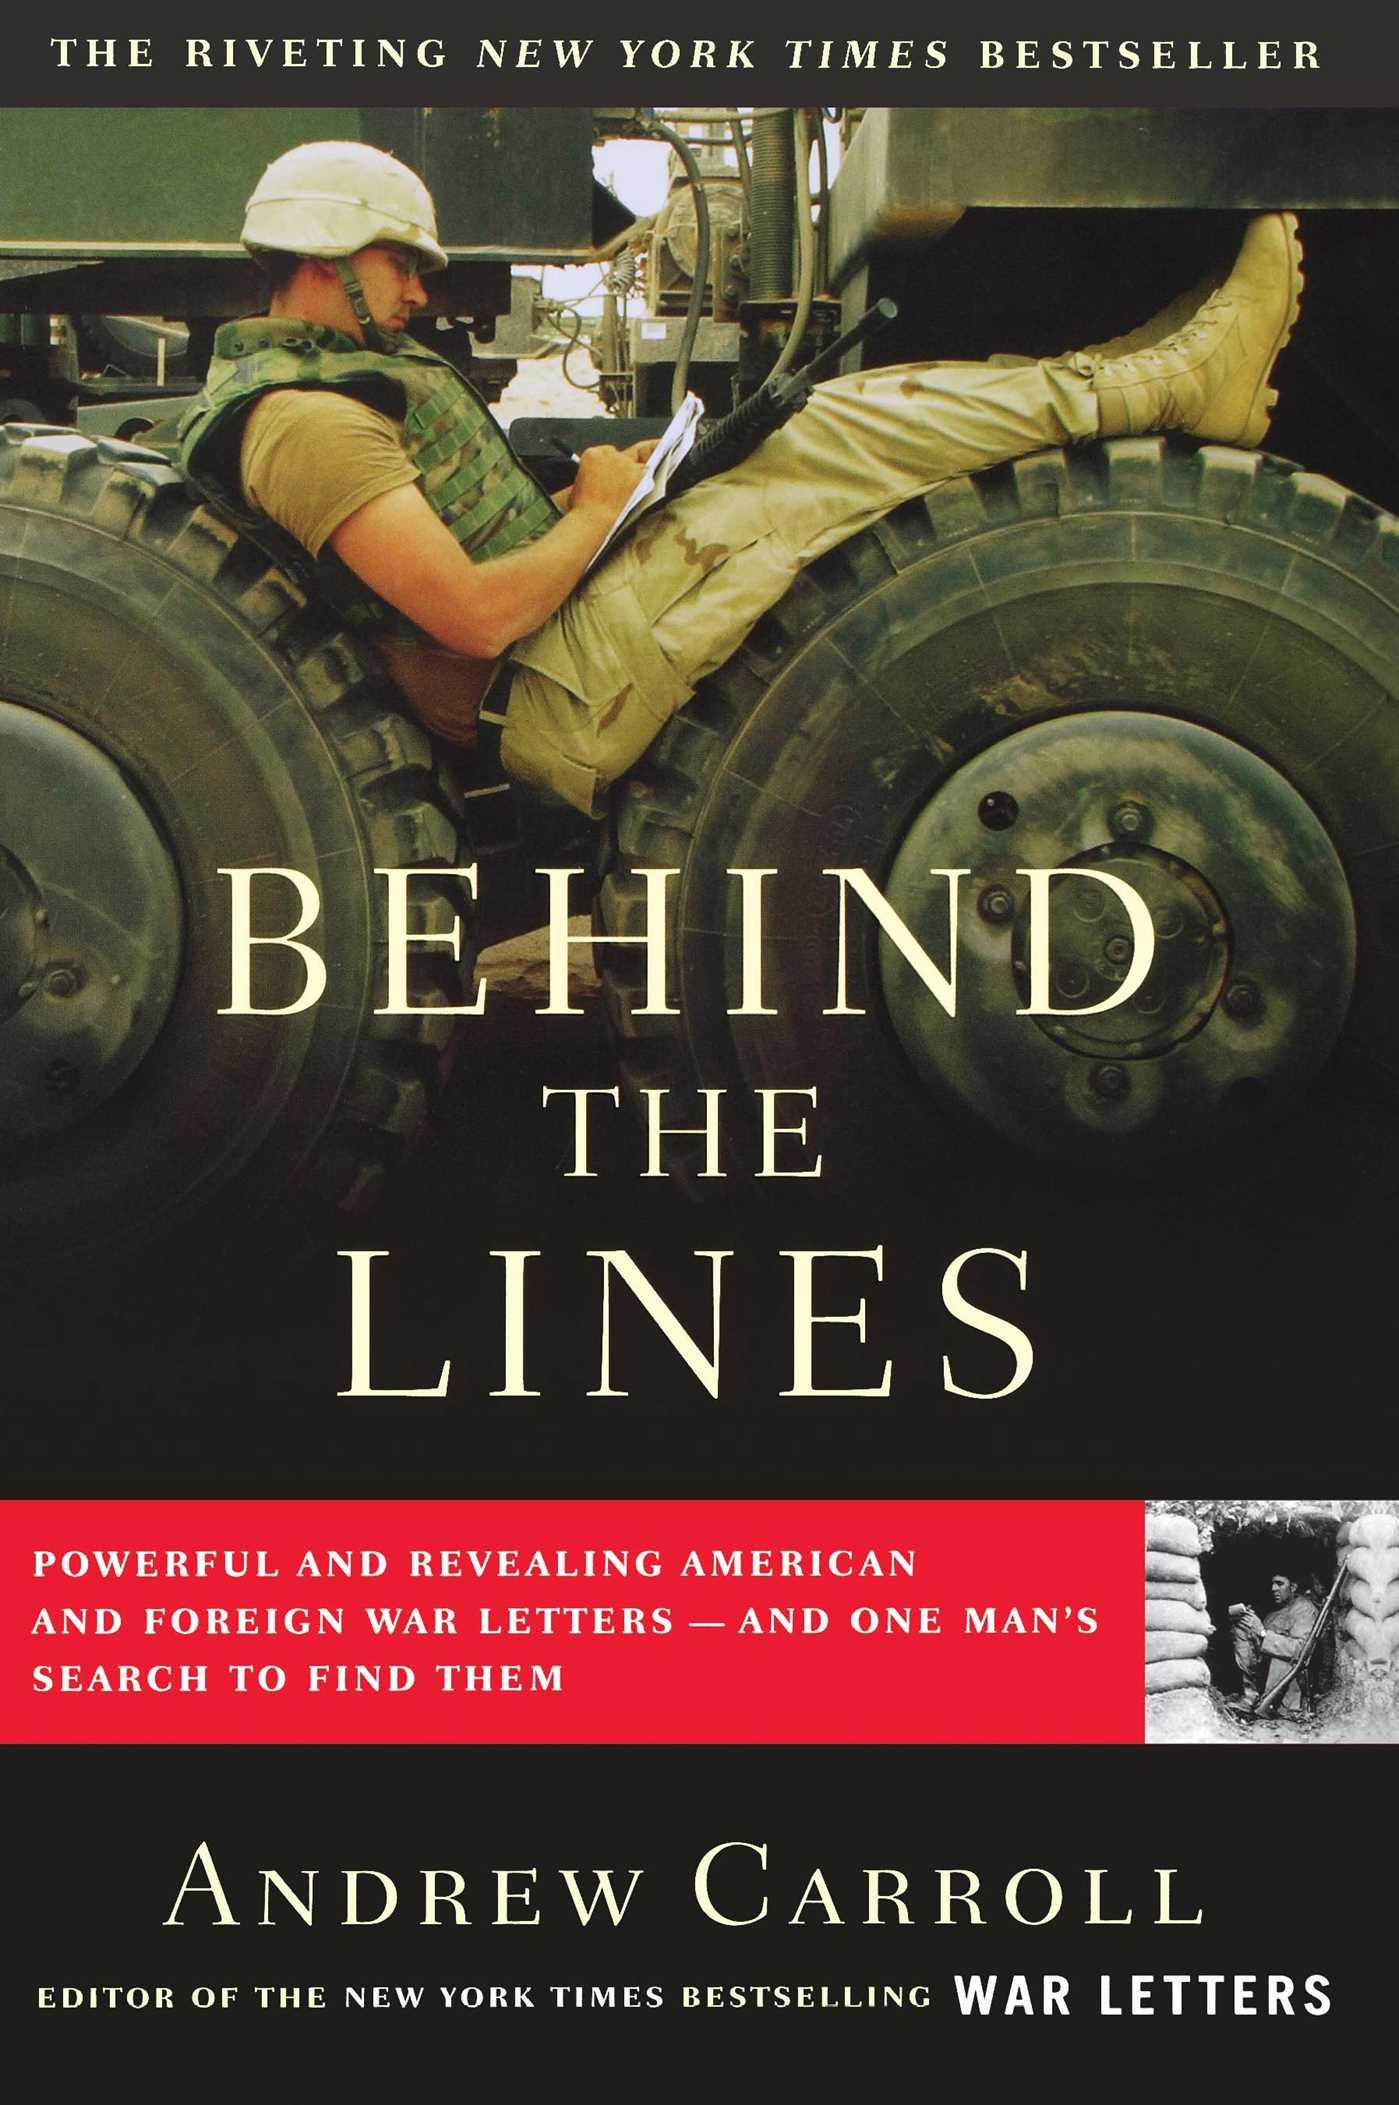 Behind the lines 9780743256179 hr